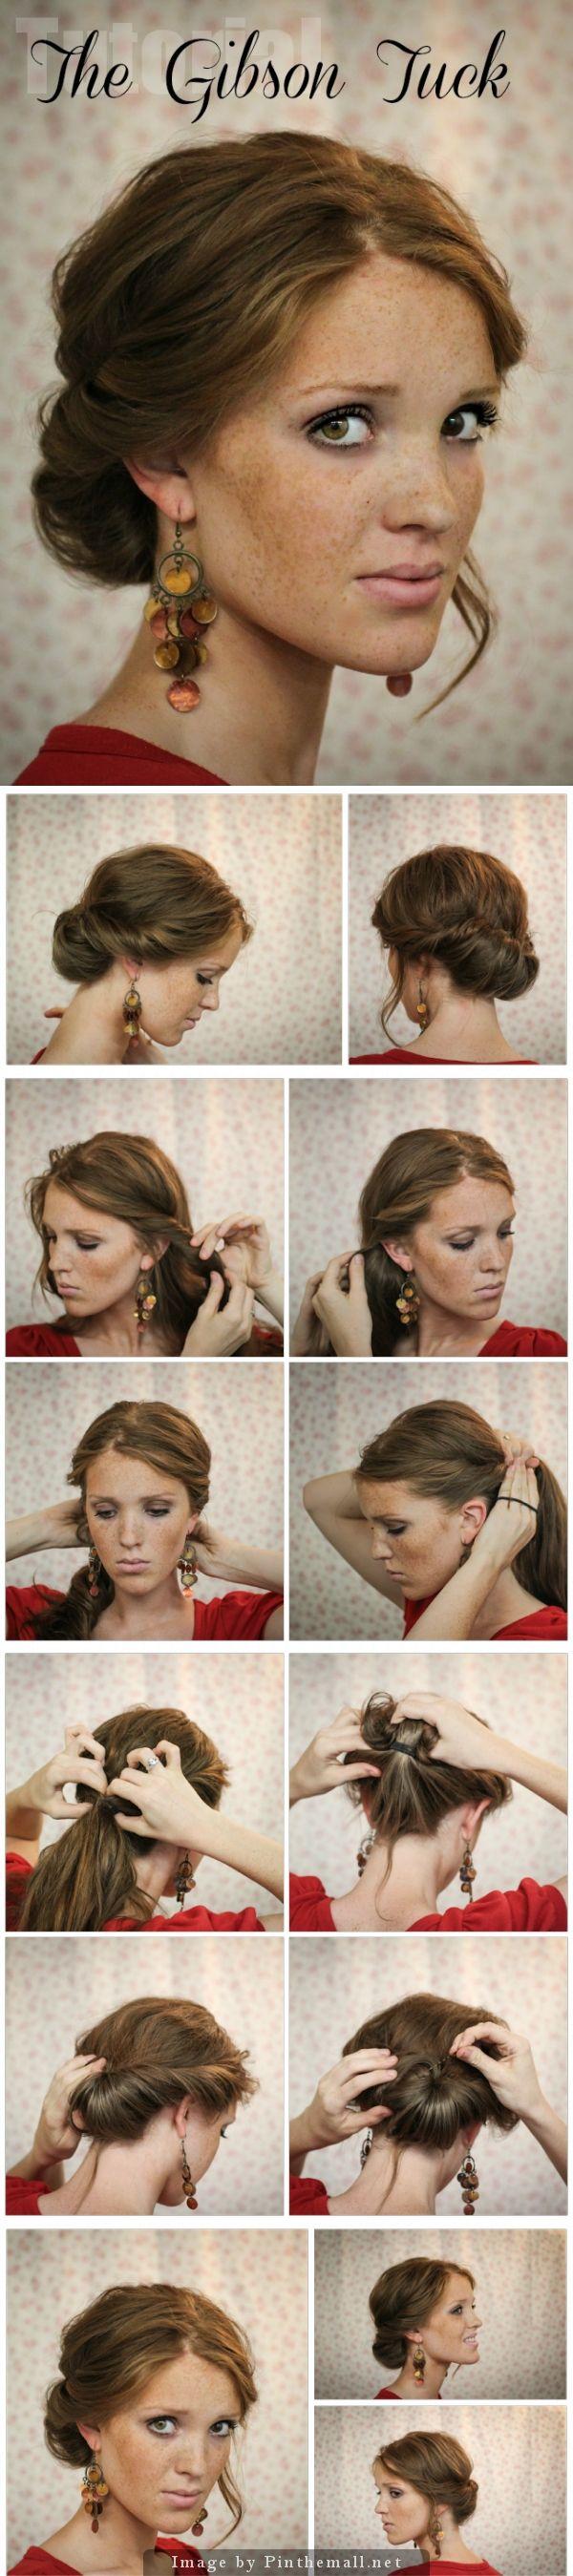 Pin by helen severhina on Прически pinterest create hair style